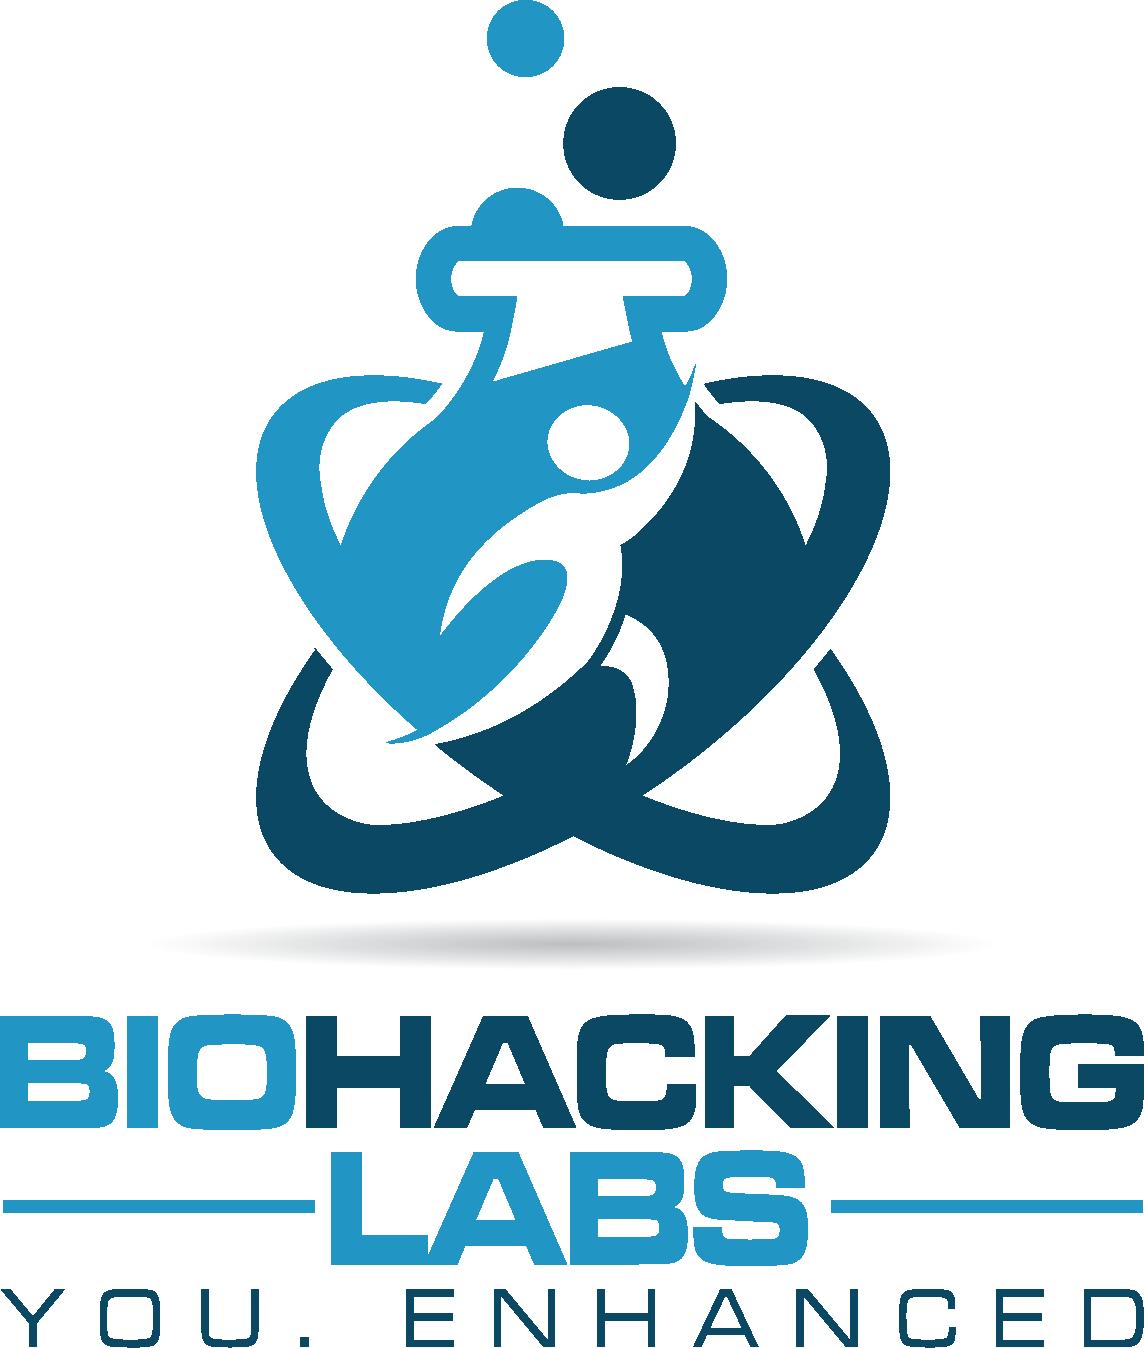 Create a logo for BioHacking Labs -- You. Enhanced.